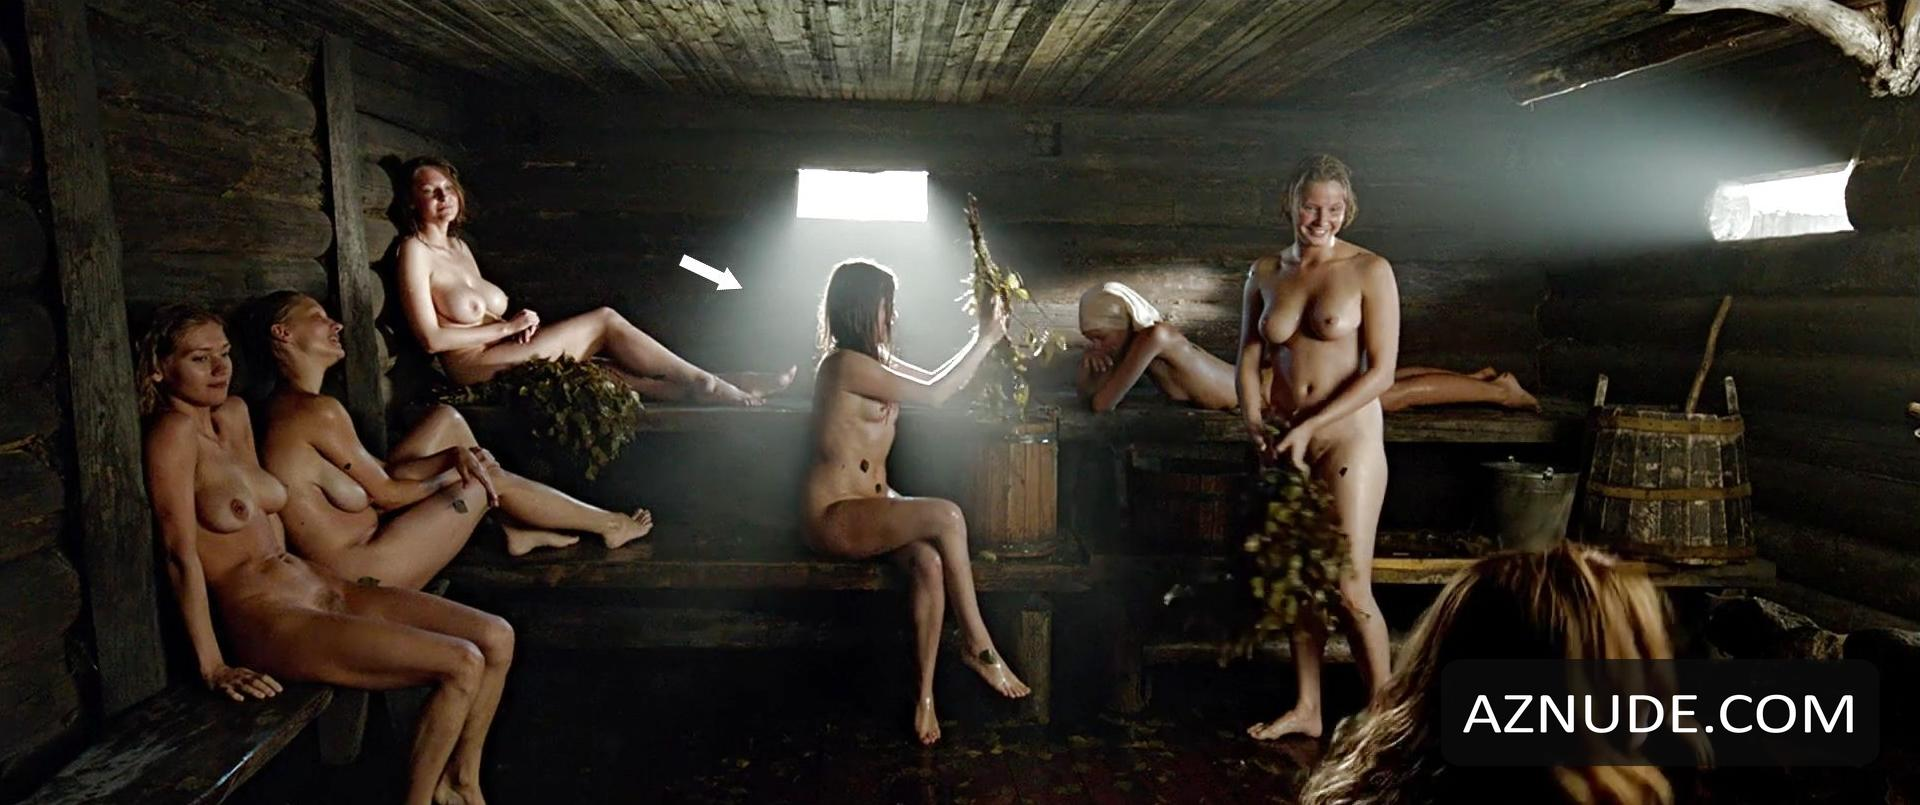 Tits Anastasiya Mikulchina nude (82 photos), Tits, Fappening, Selfie, bra 2015